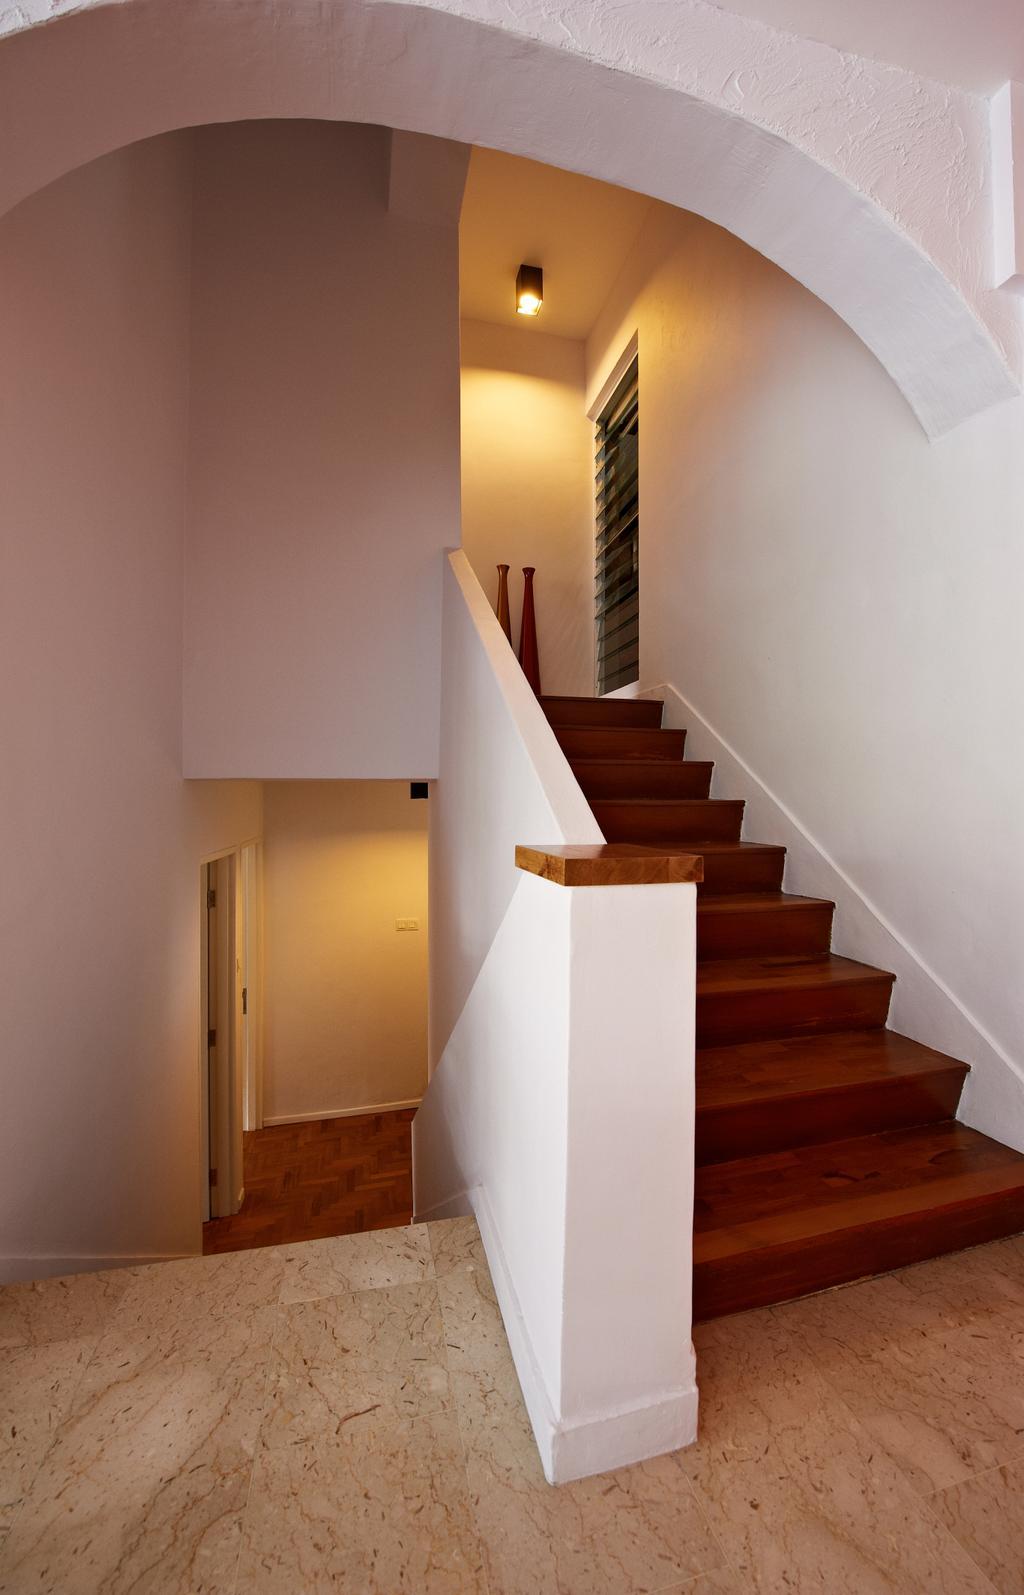 Contemporary, Condo, Hillcrest Arcadia, Interior Designer, Seven Heaven, Banister, Handrail, Staircase, HDB, Building, Housing, Indoors, Loft